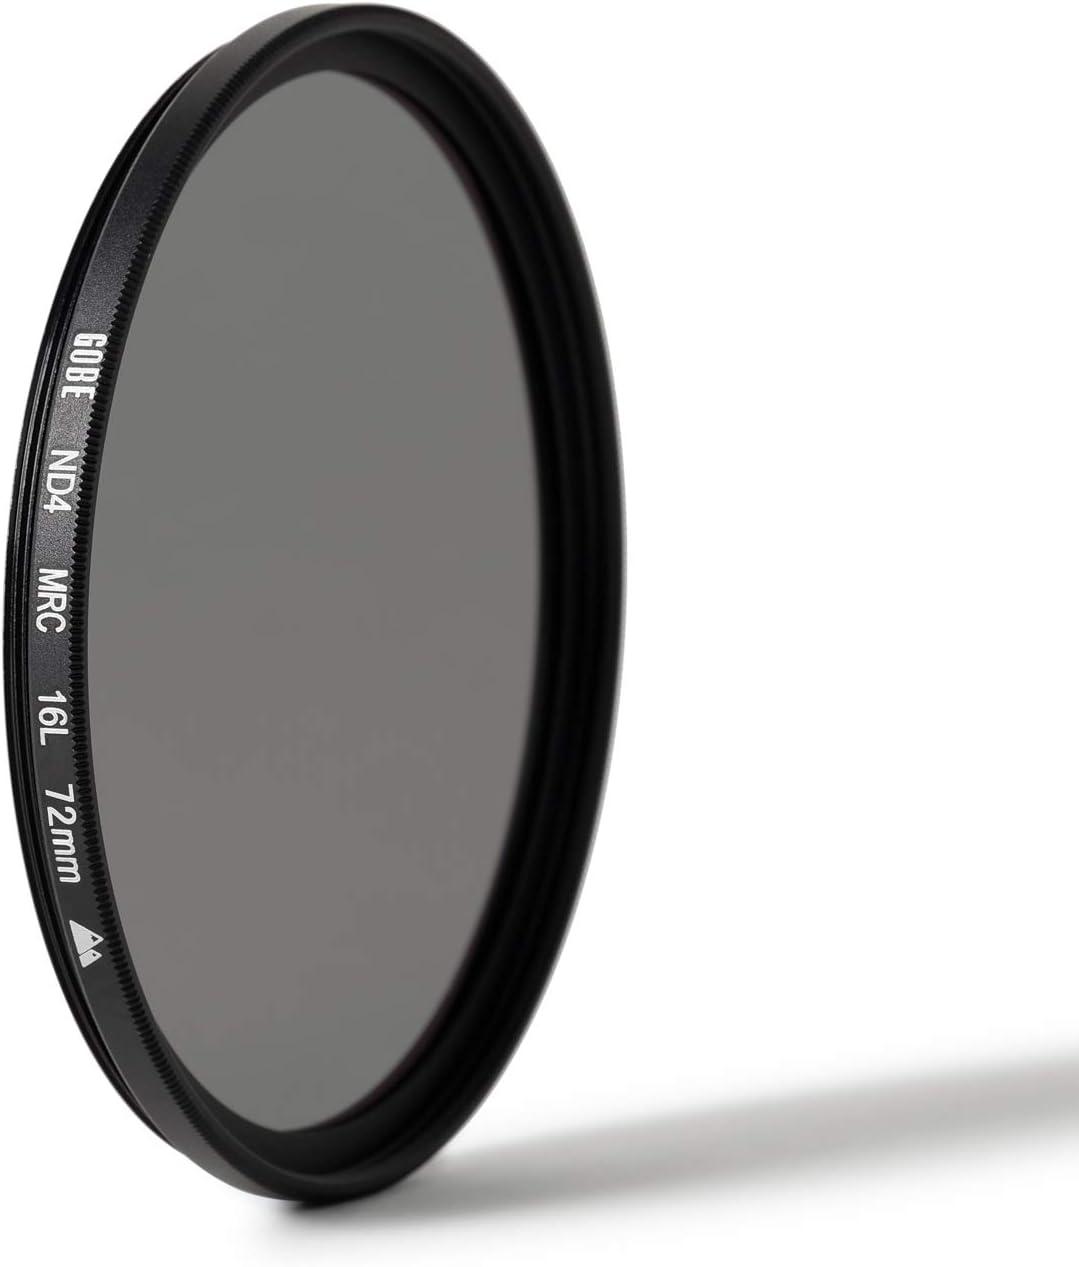 2 Stop Gobe 46mm ND4 2Peak ND Lens Filter